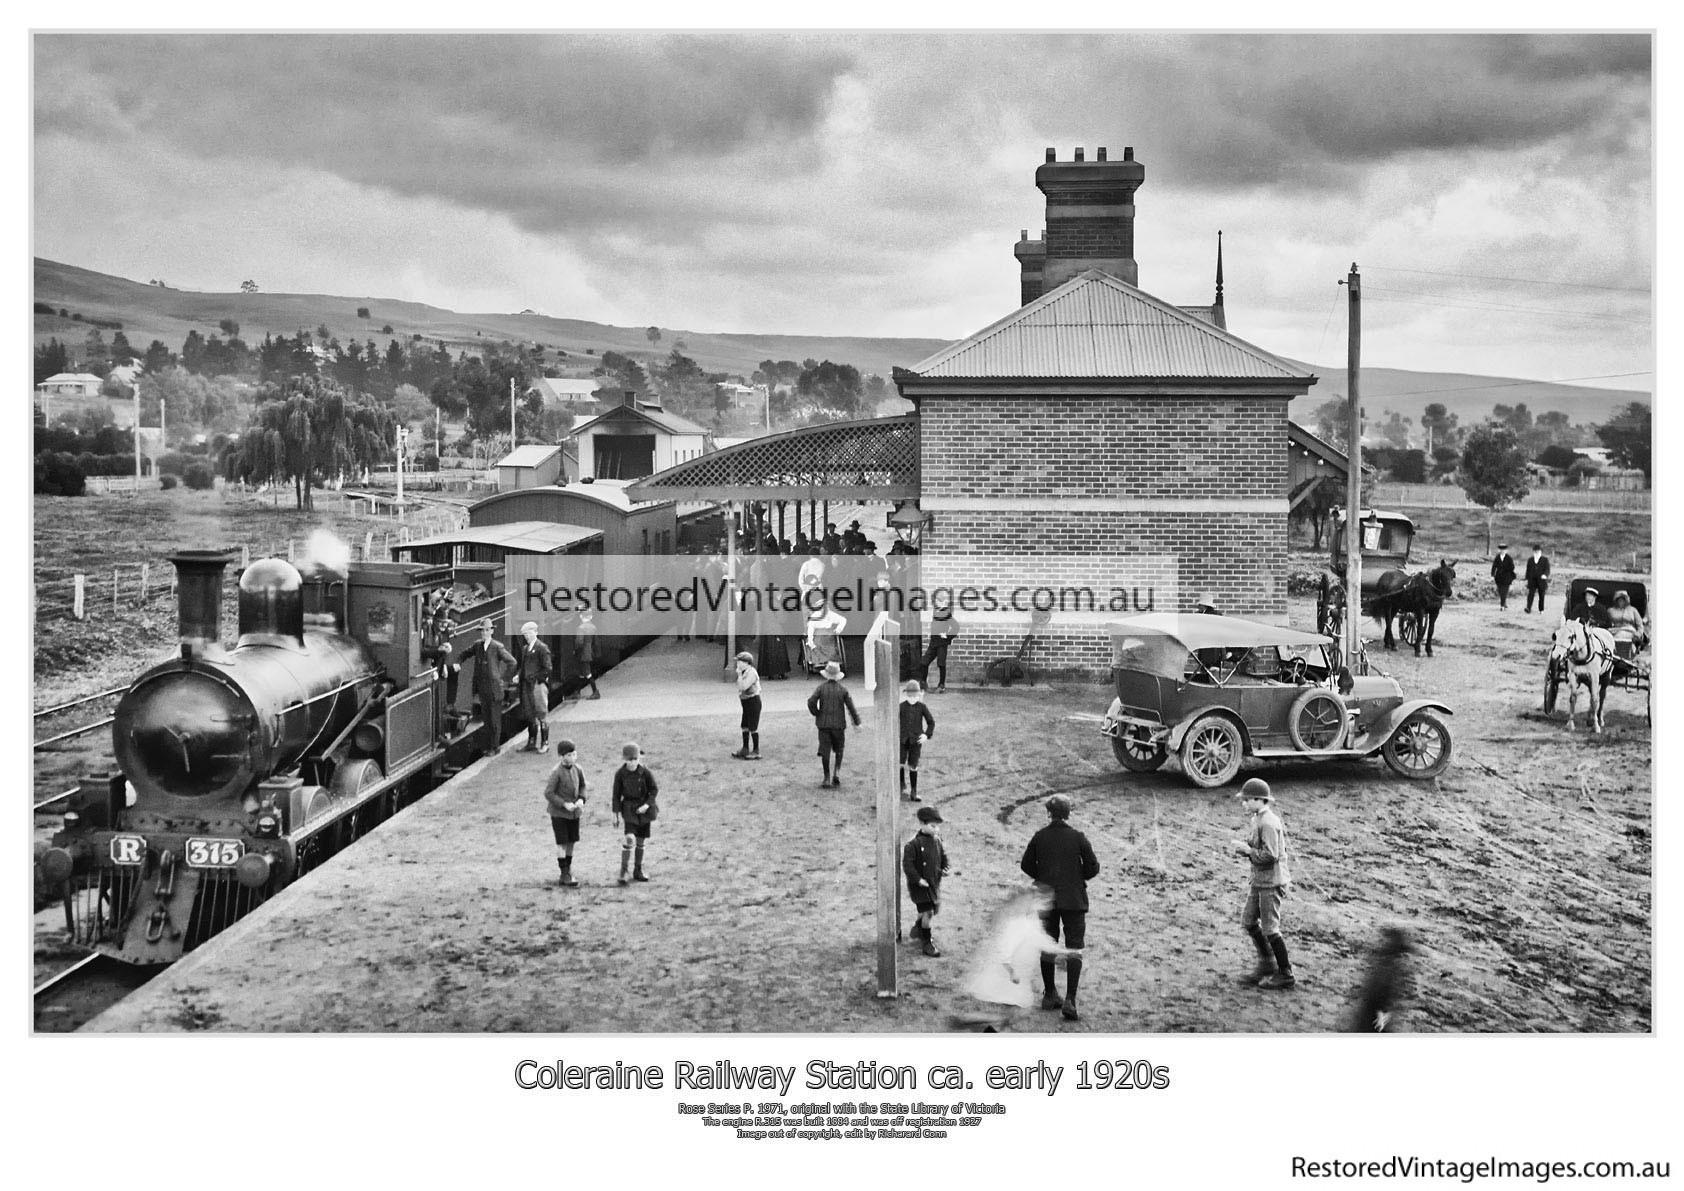 Coleraine Railway Station 1920s